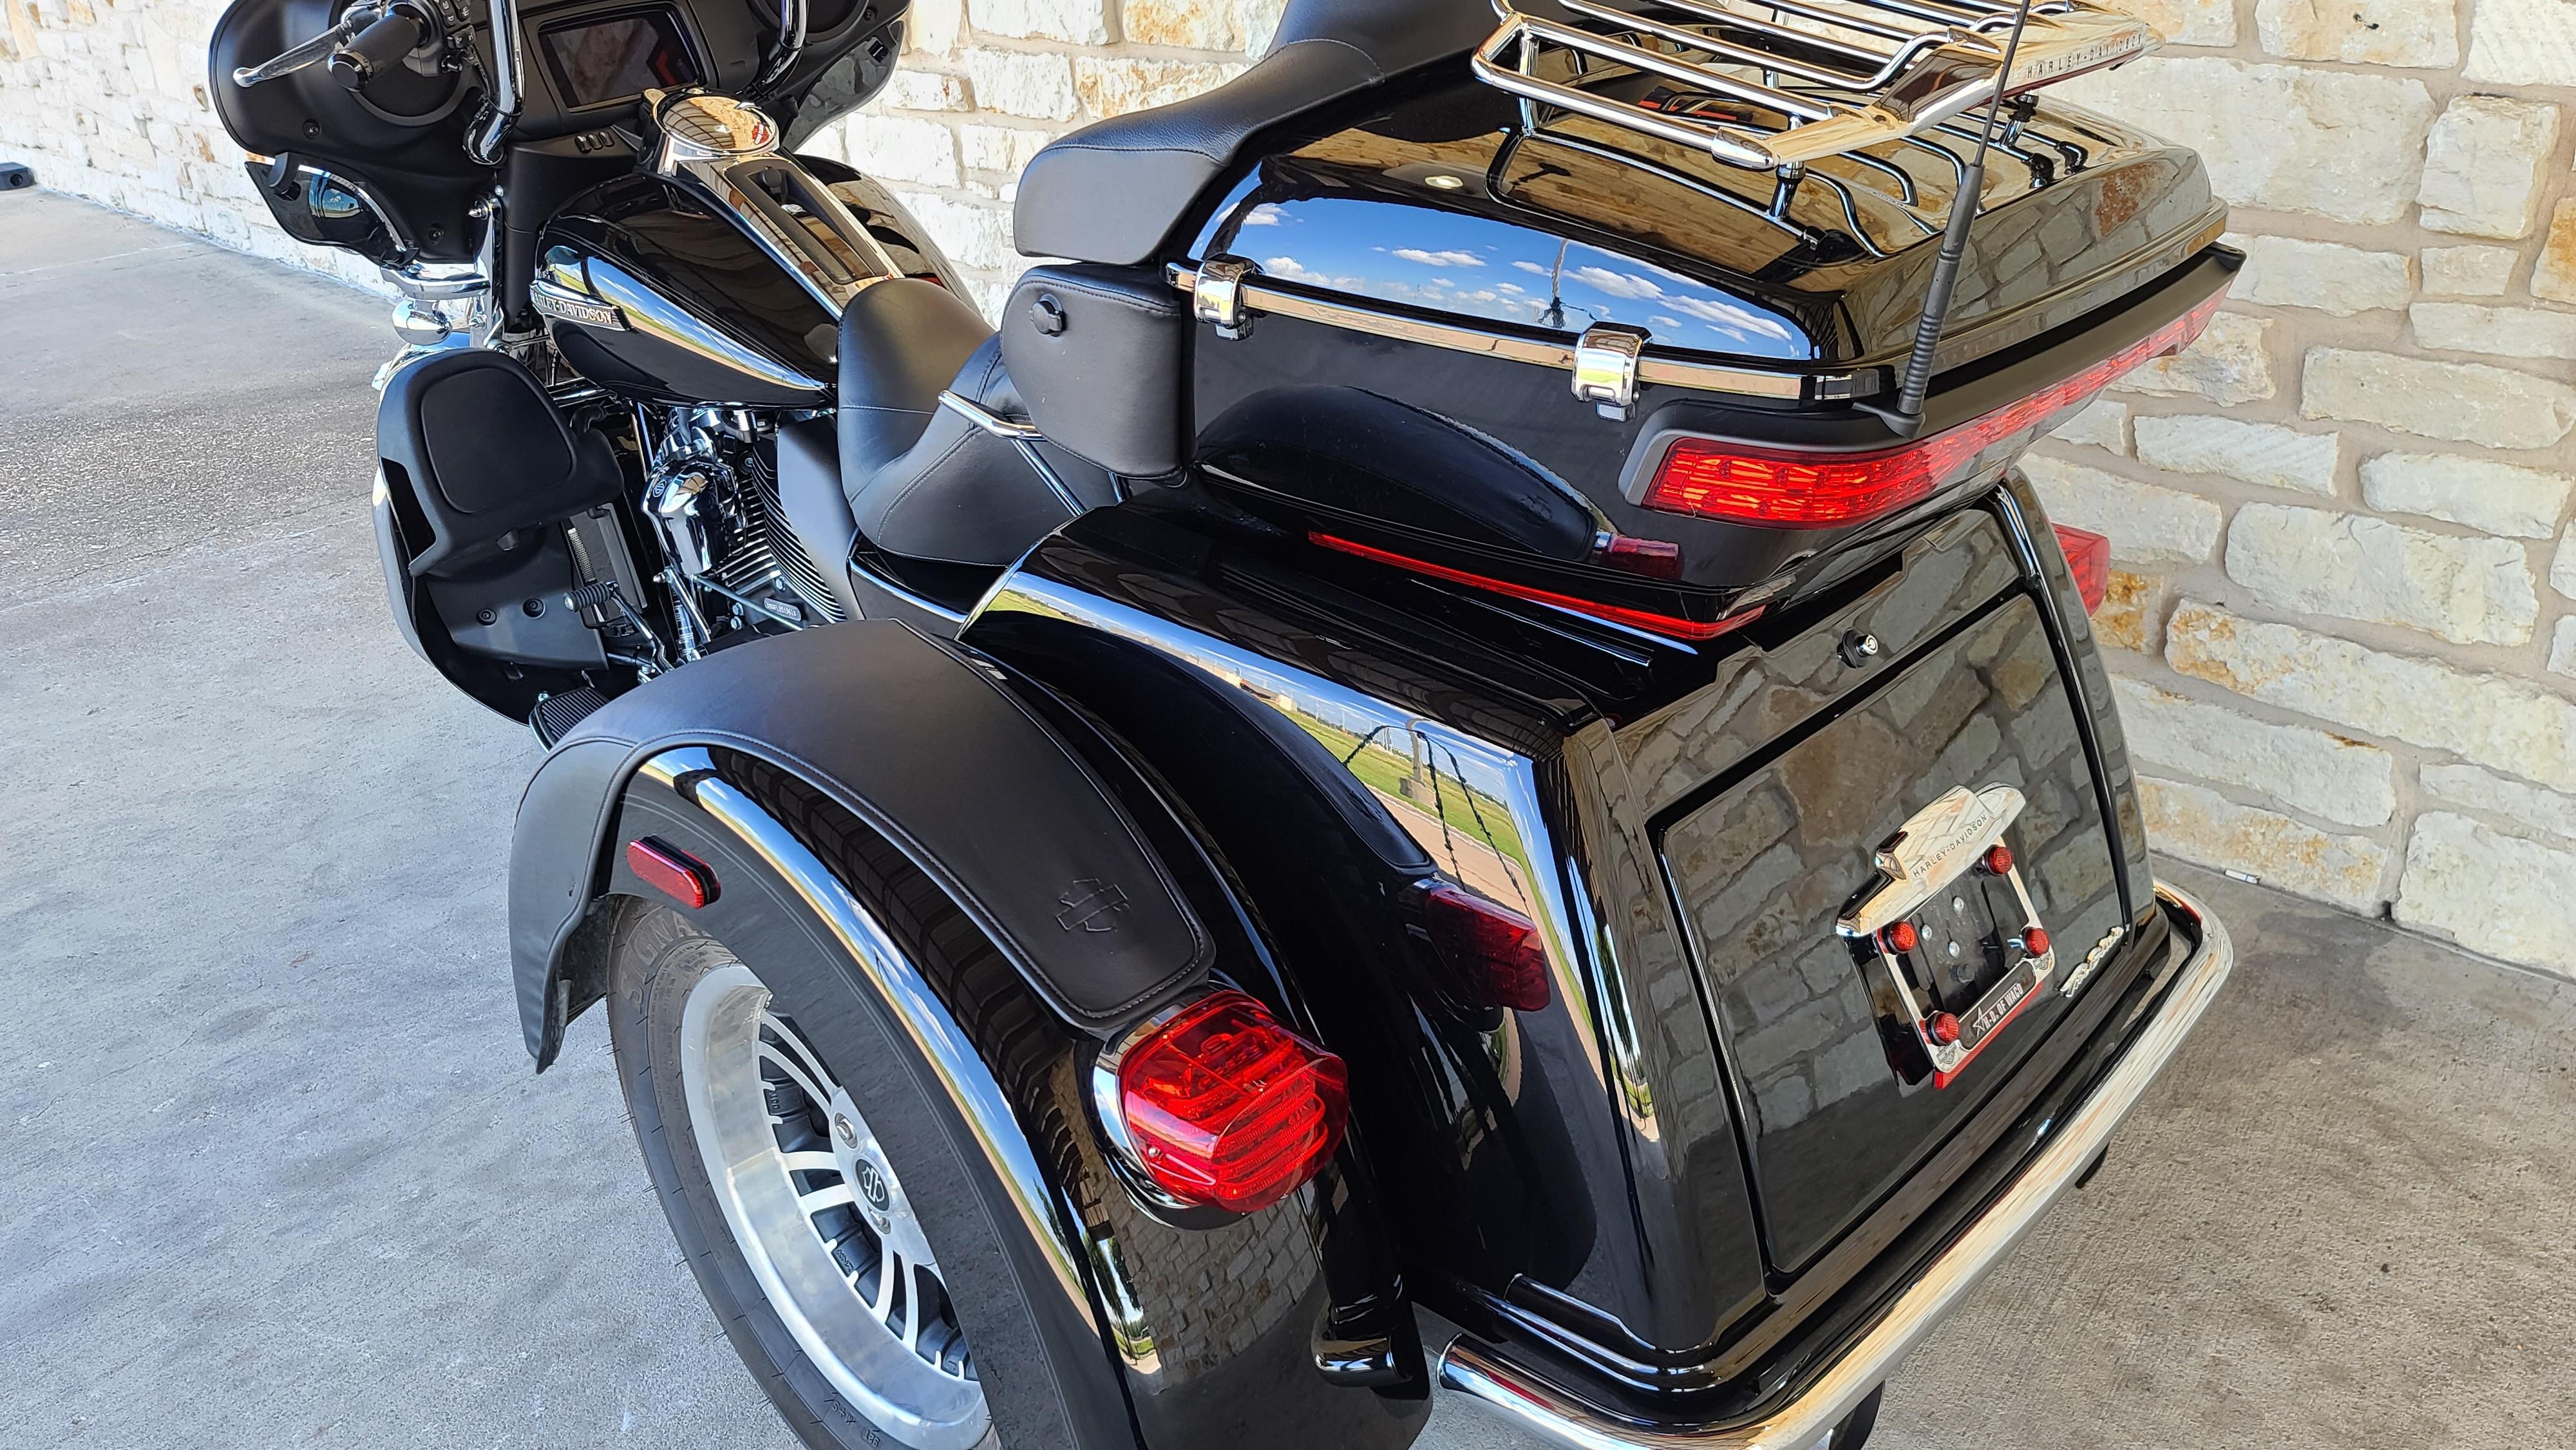 2020 Harley-Davidson Trike Tri Glide Ultra at Harley-Davidson of Waco